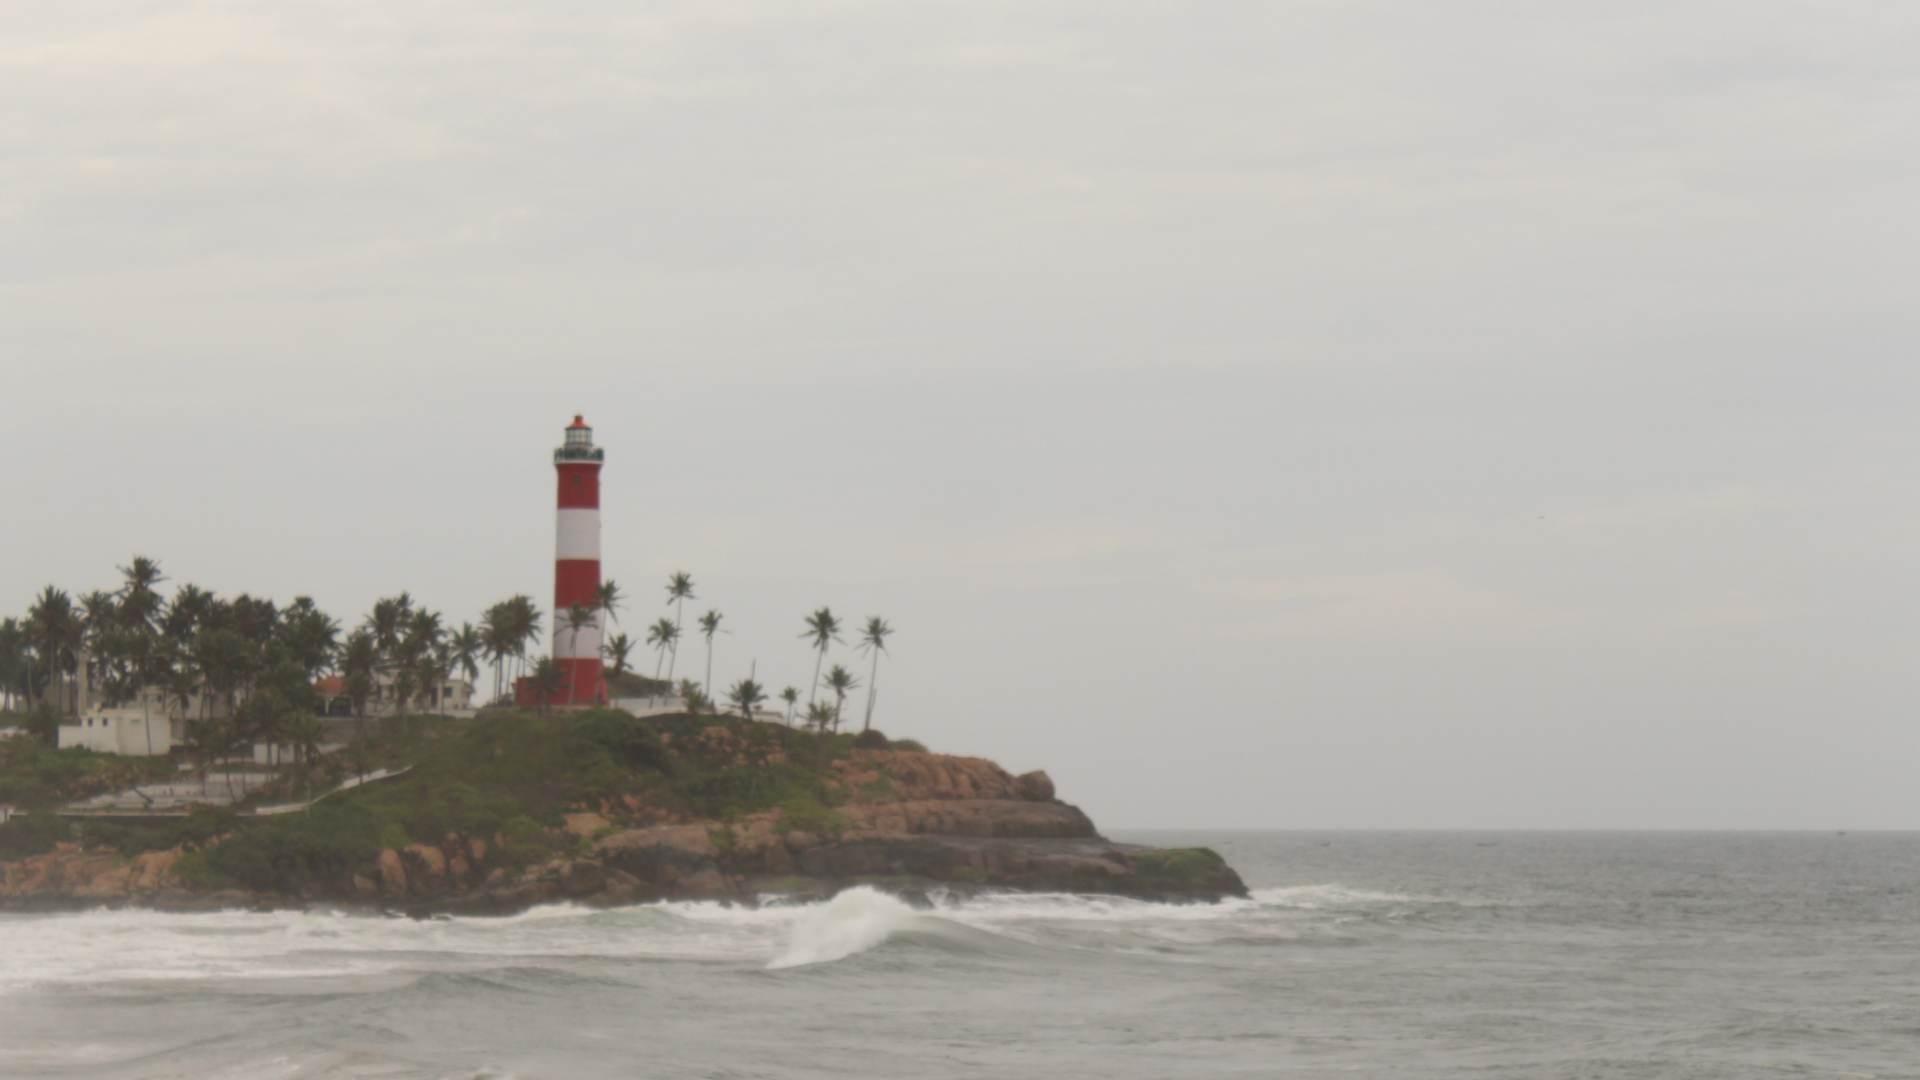 Light House at a Kovalam Beach